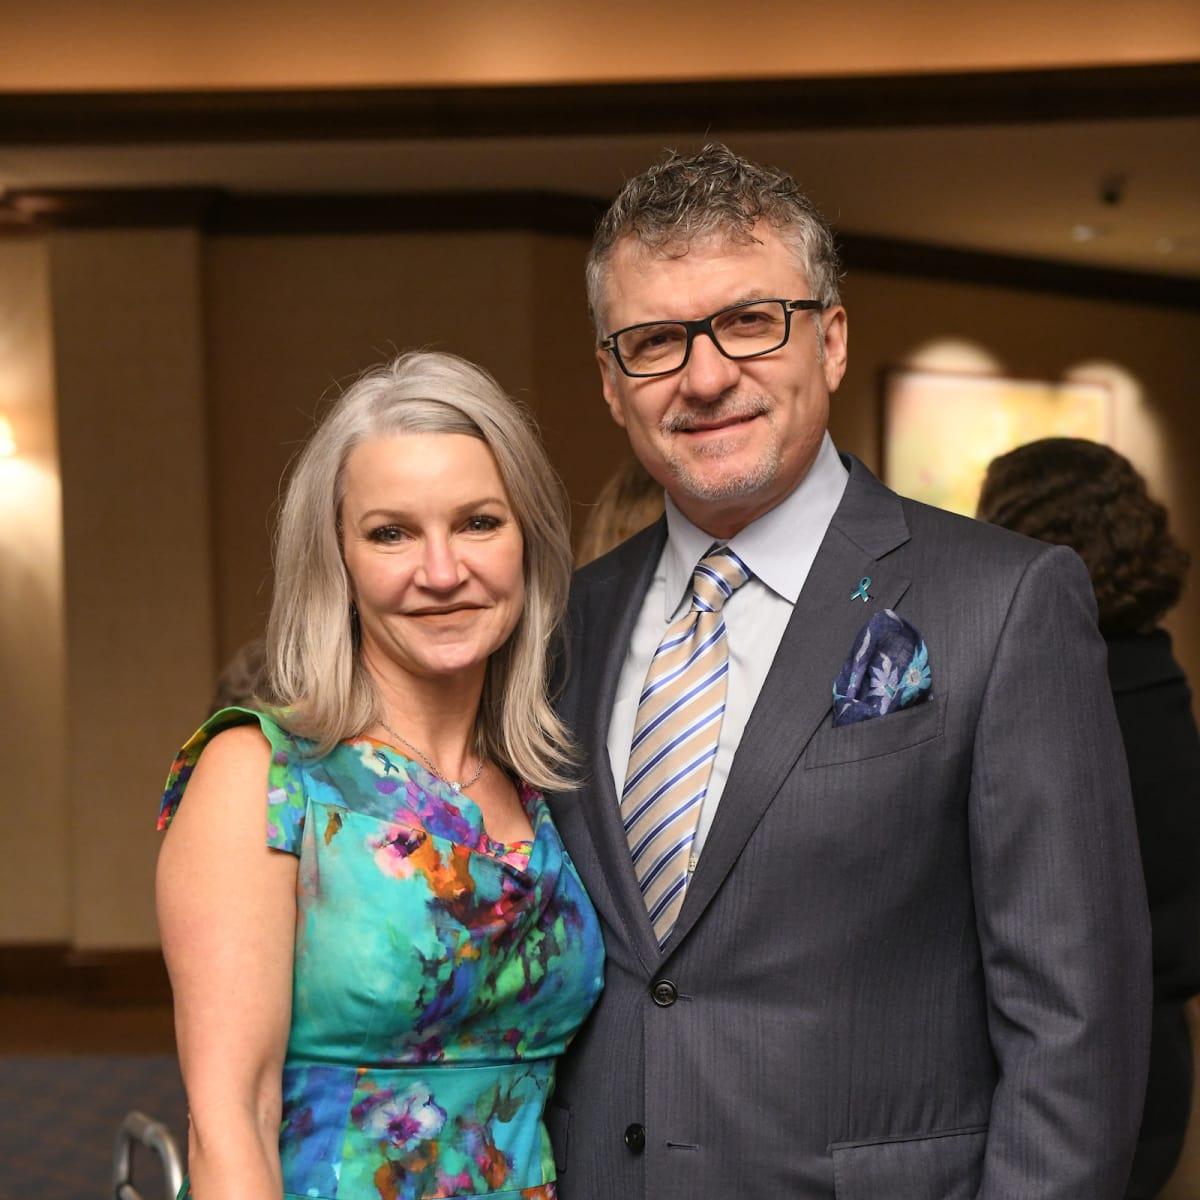 Maureen and Dr Douglas Hirsch/Judys Mission